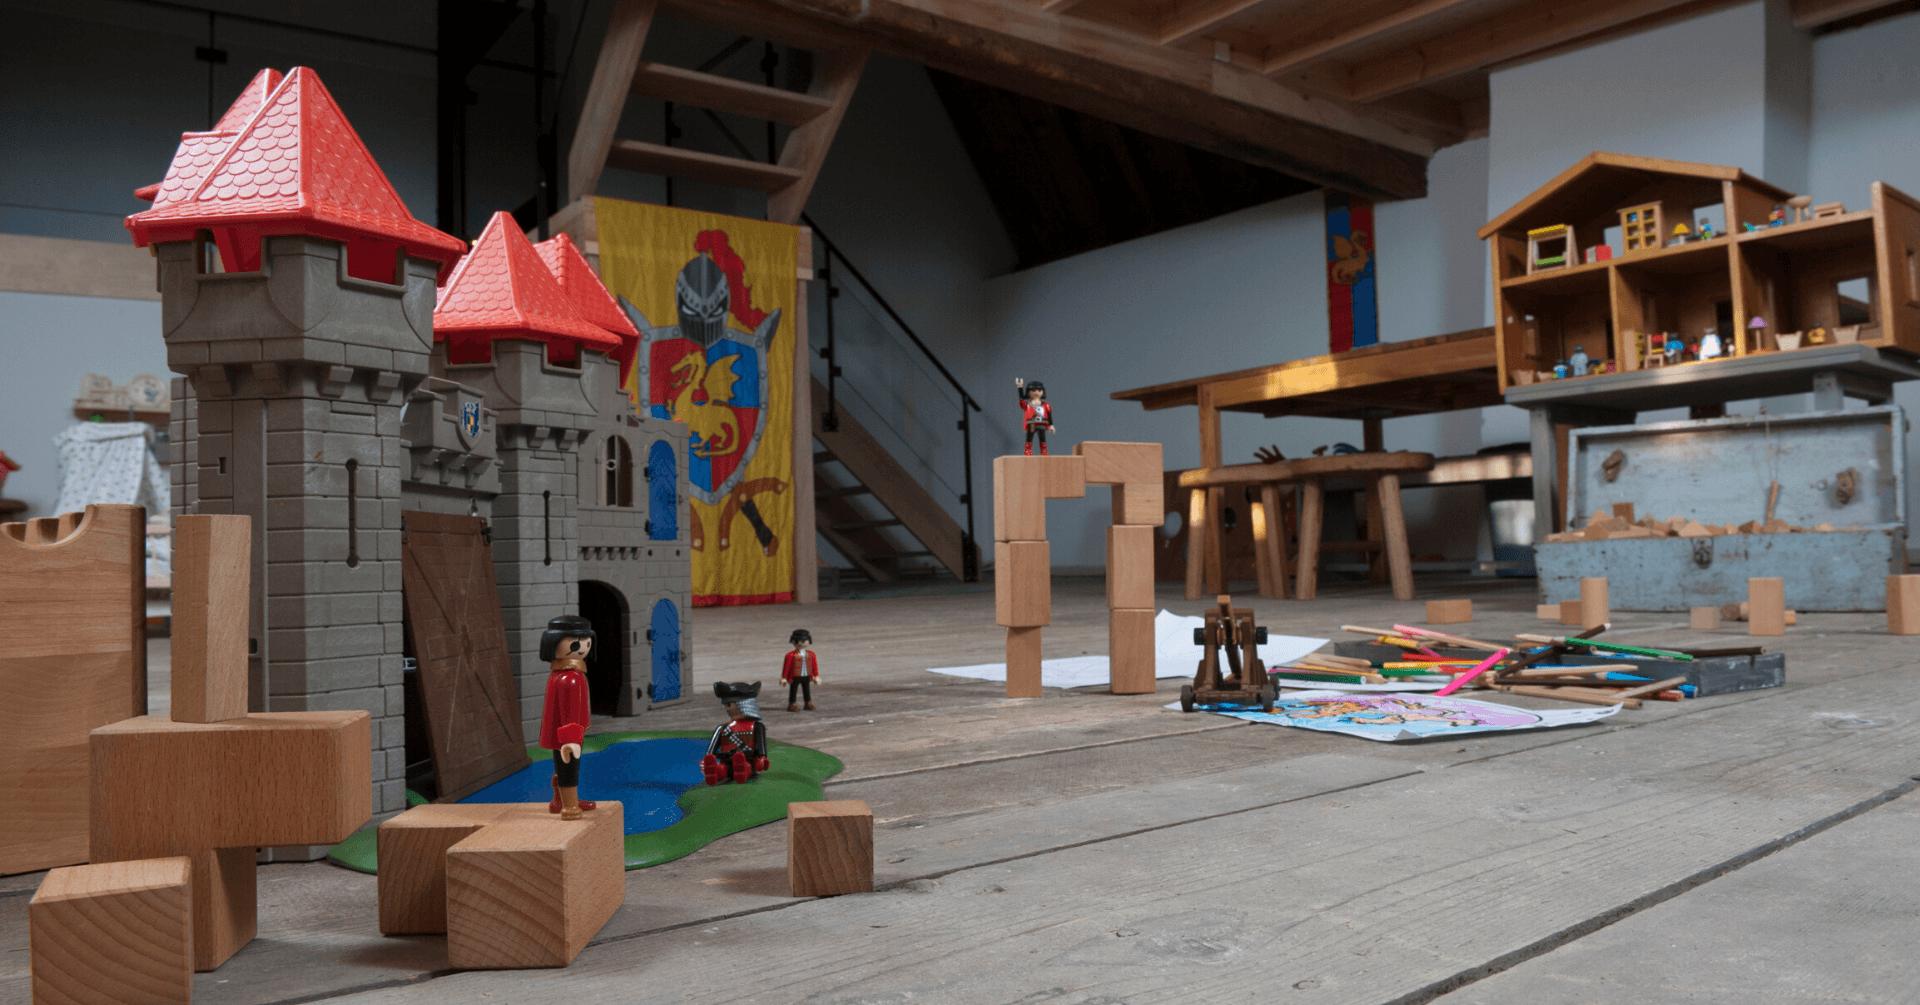 Radboud Castle-Play attic-Photo credits Duco de Vries